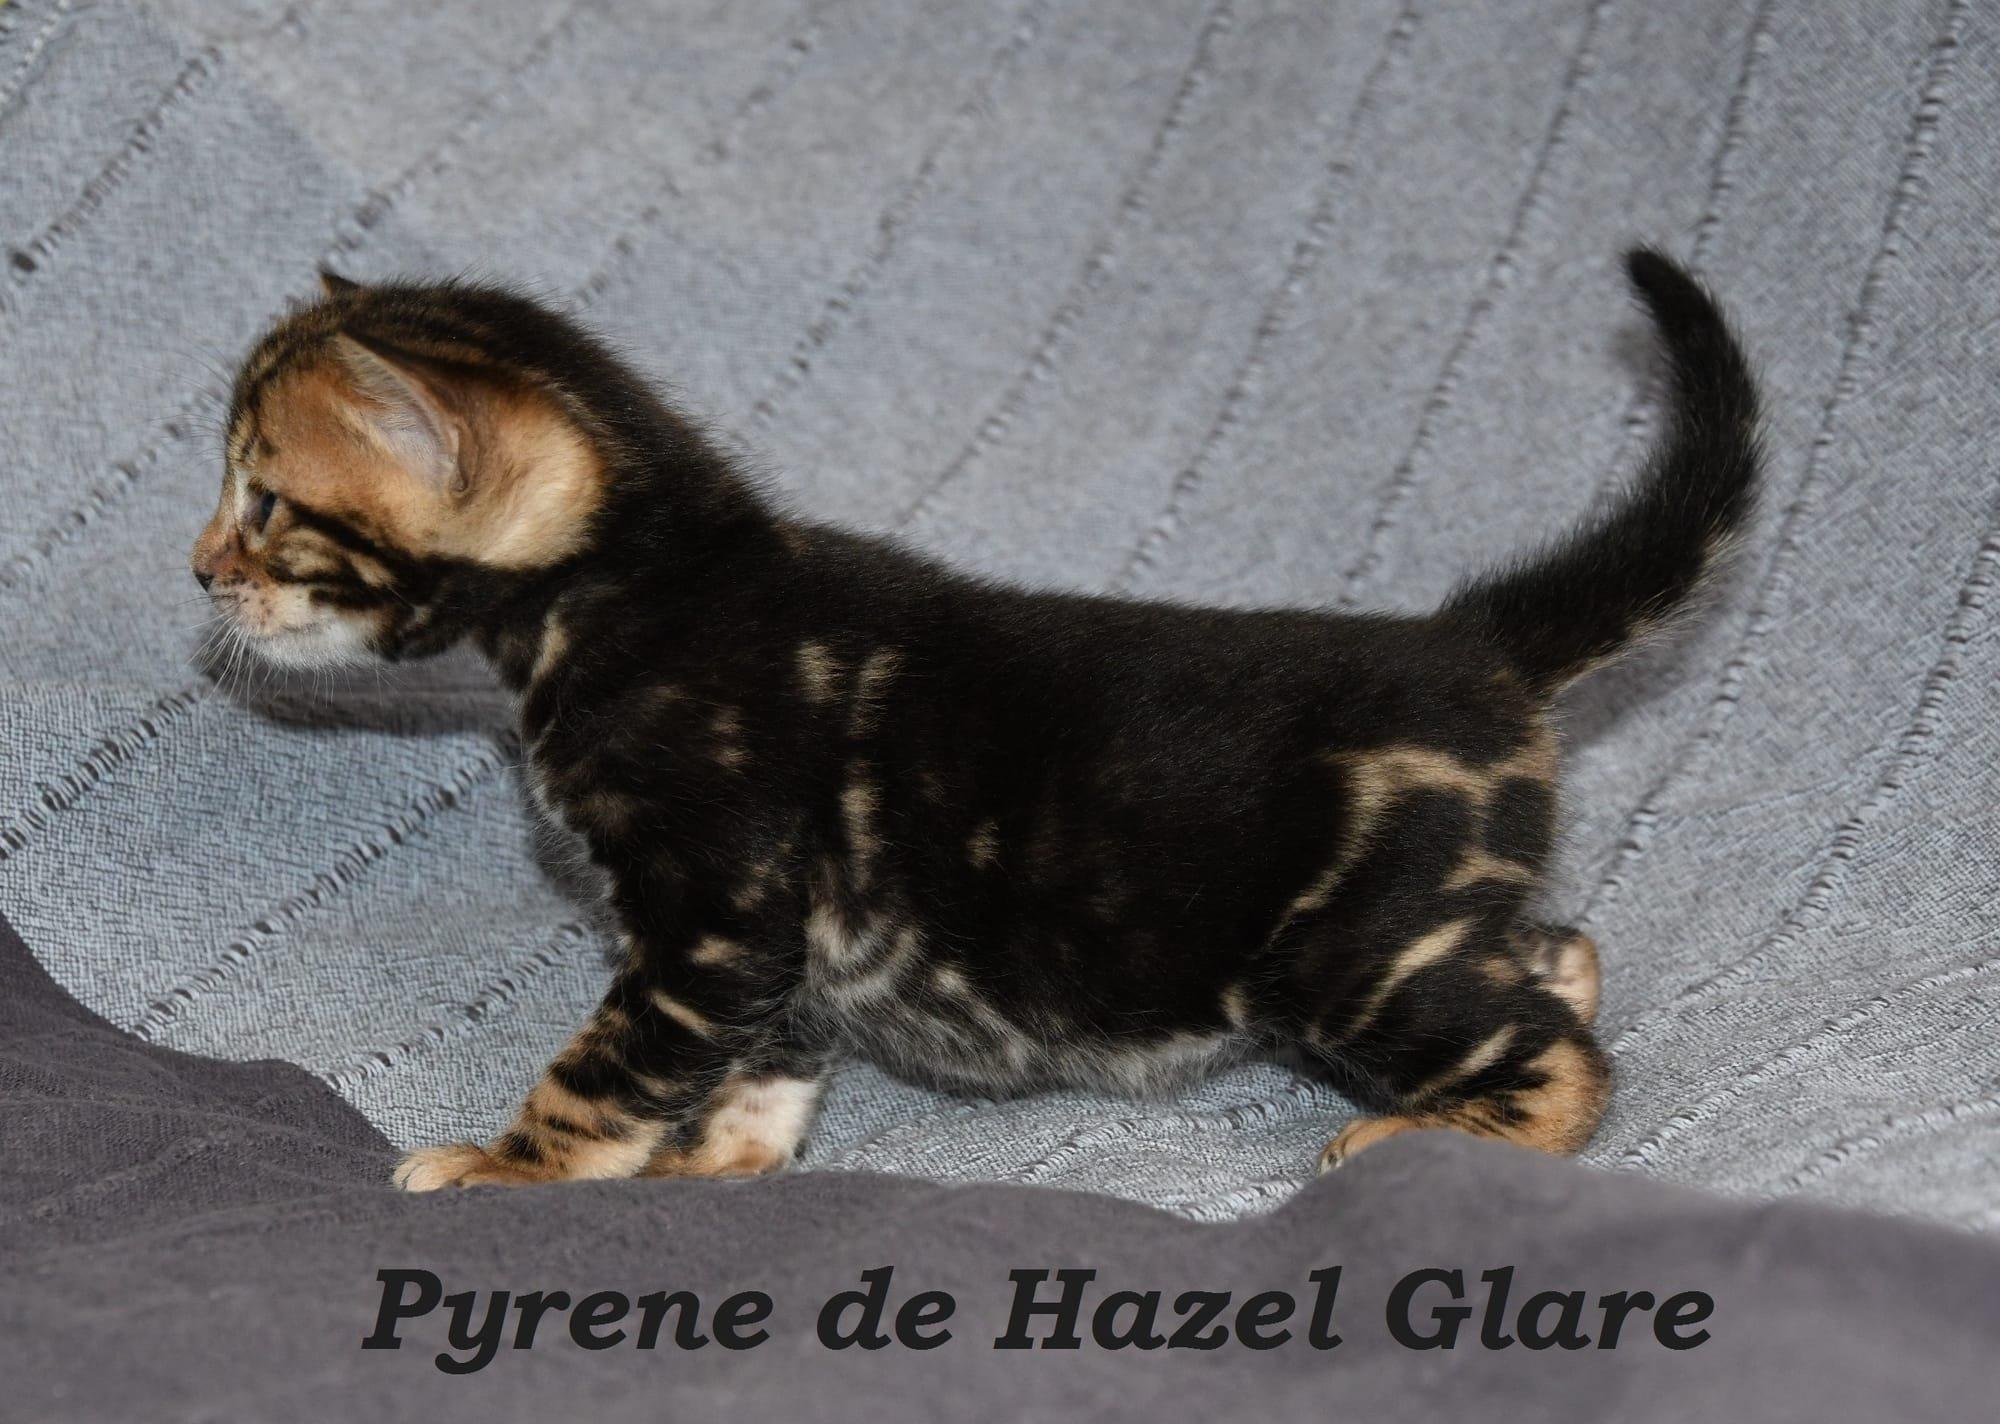 Pyrene de Hazel Glare